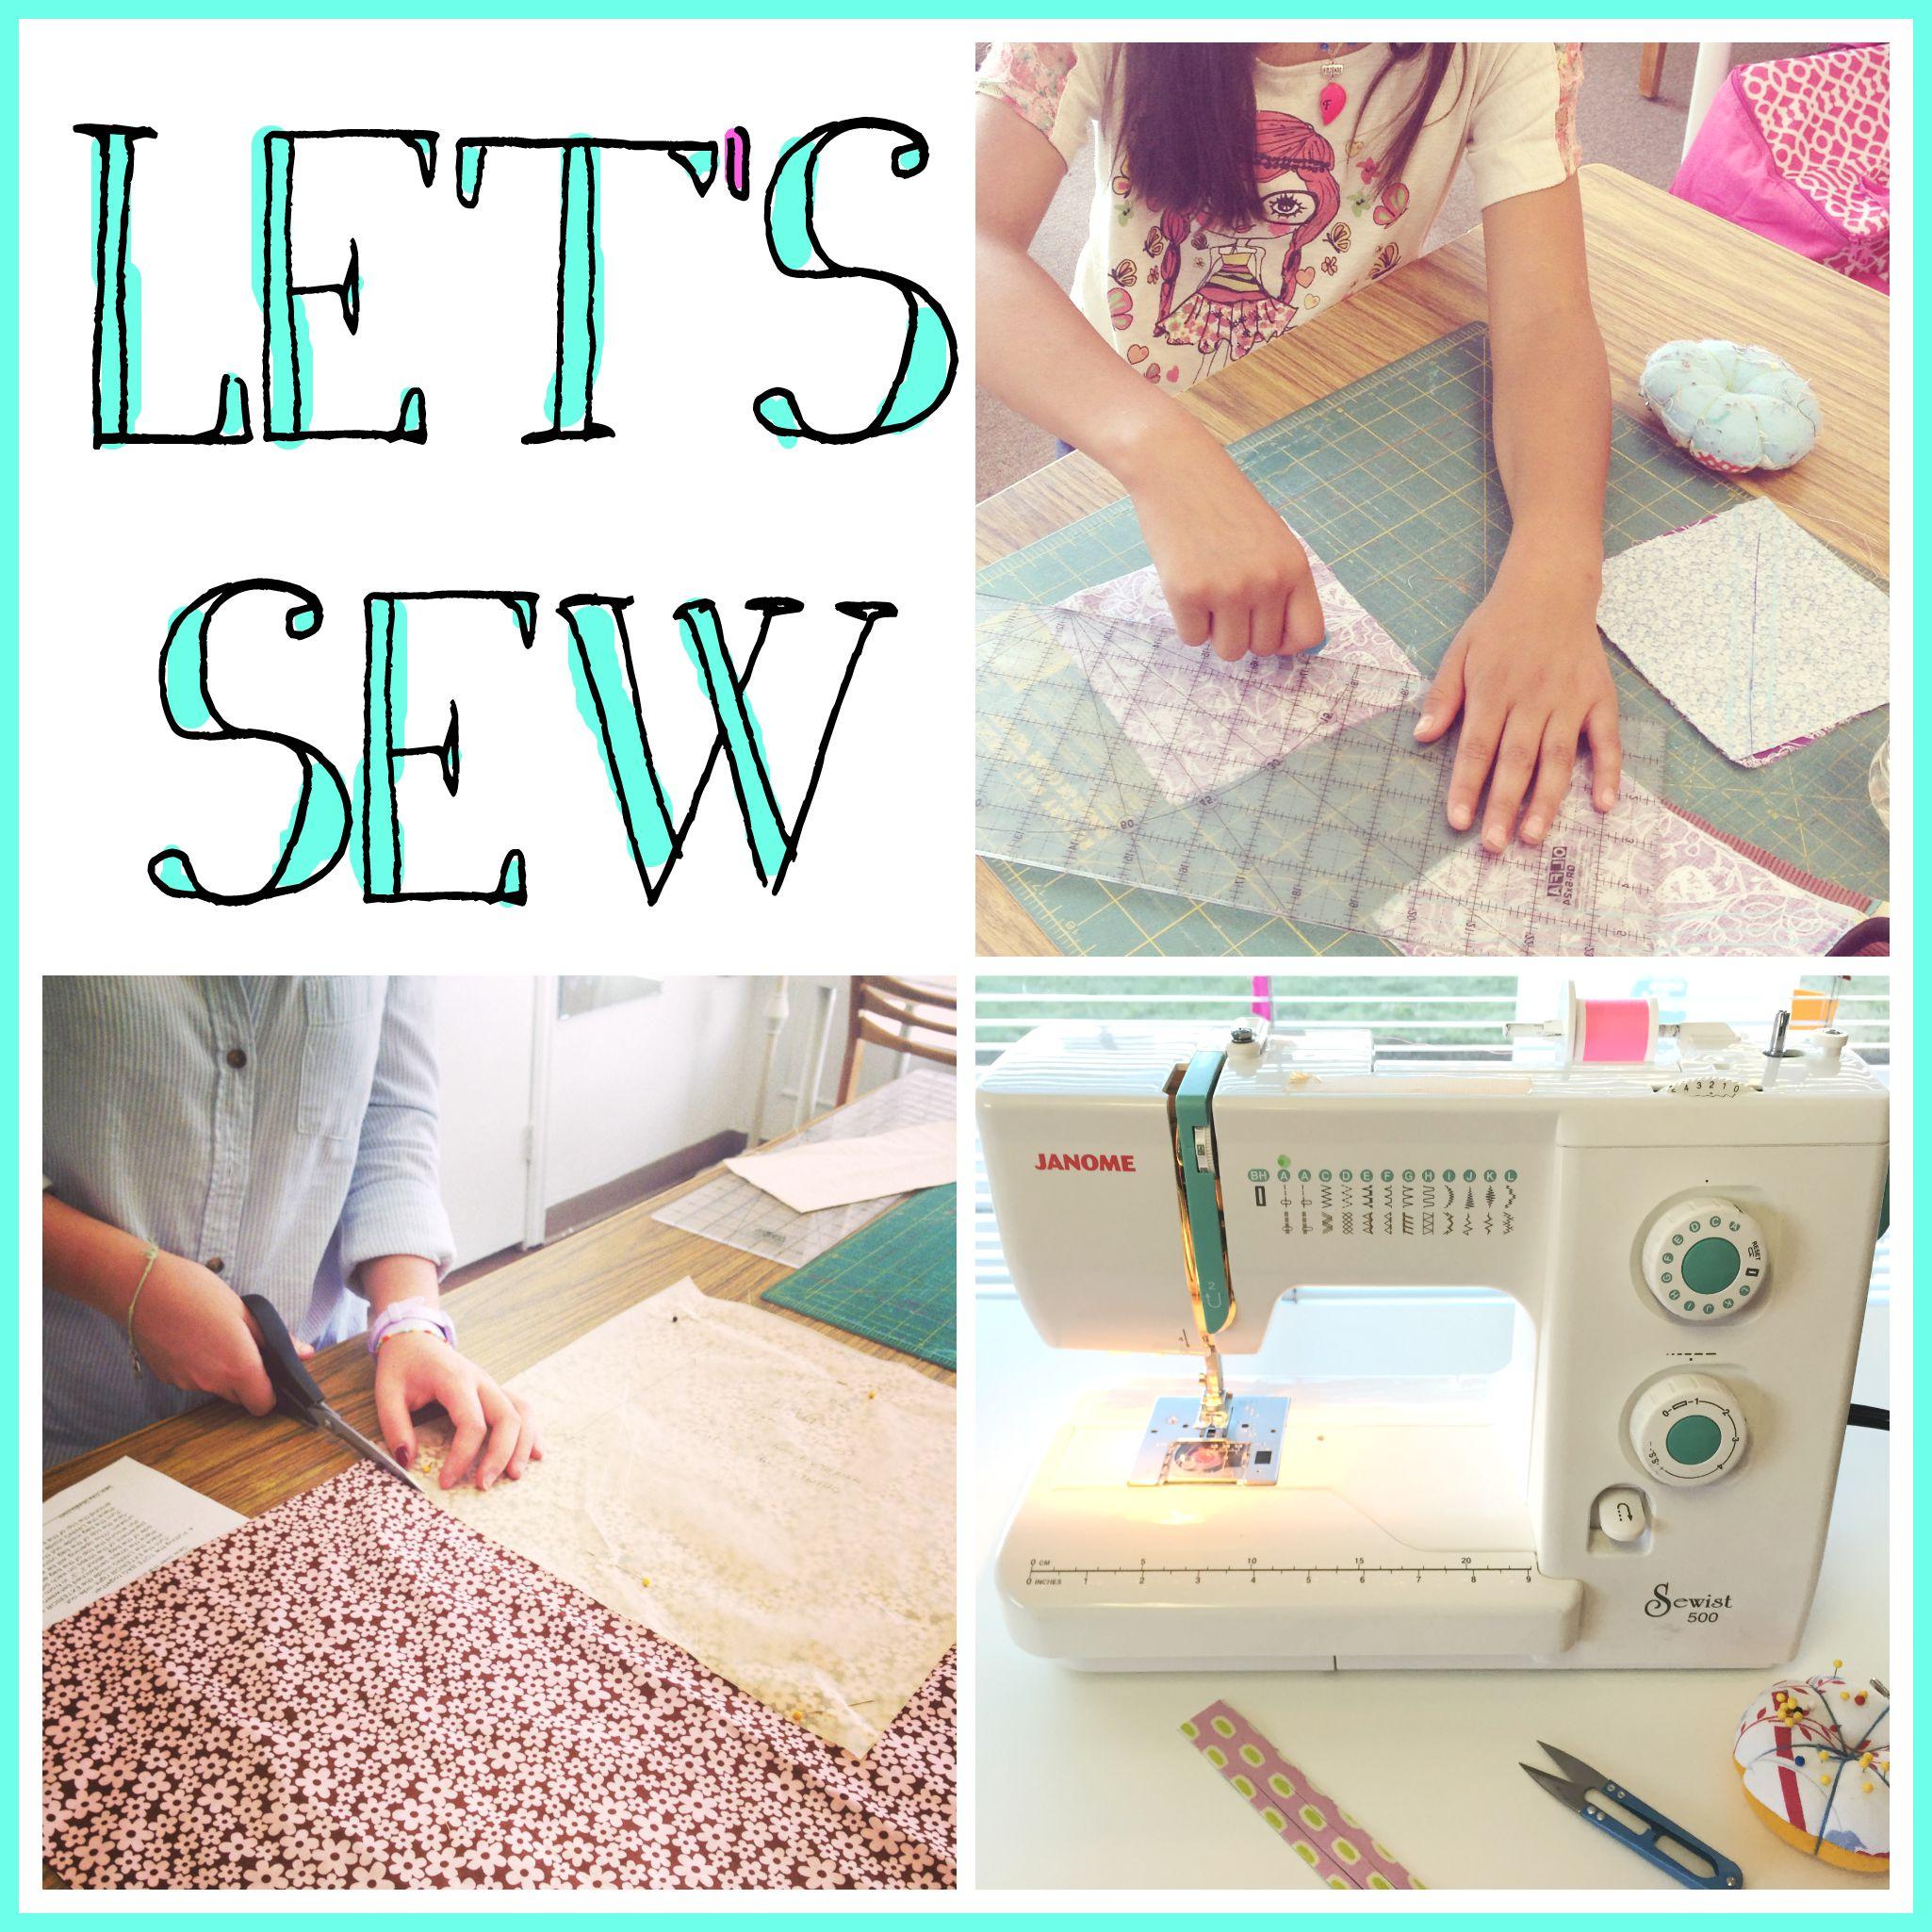 Let's Sew   Sew You Studio.com